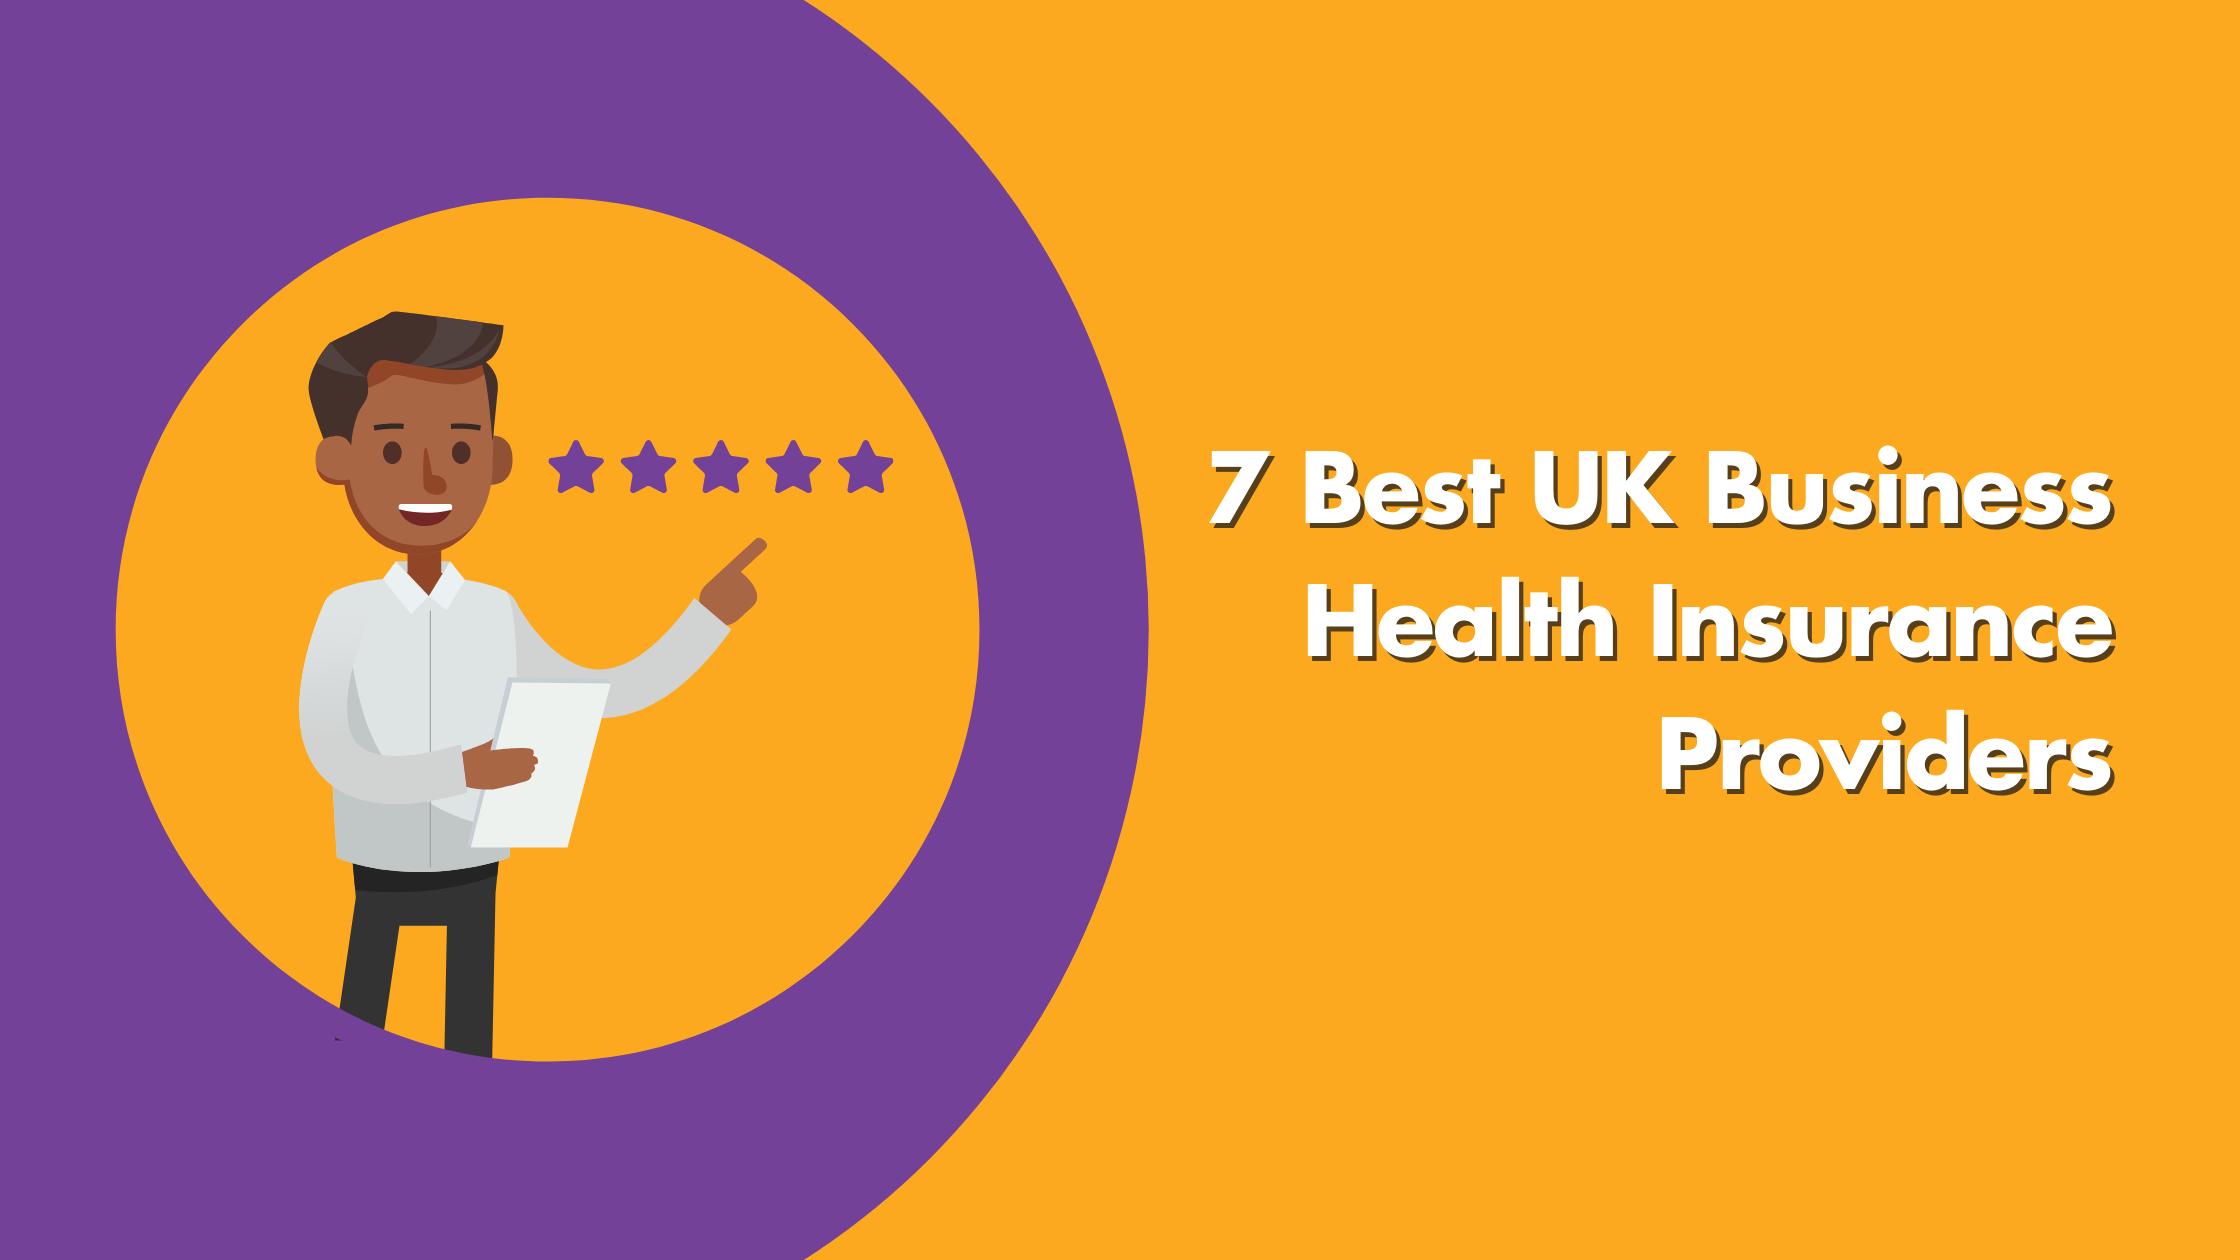 Best UK Business Health Insurance